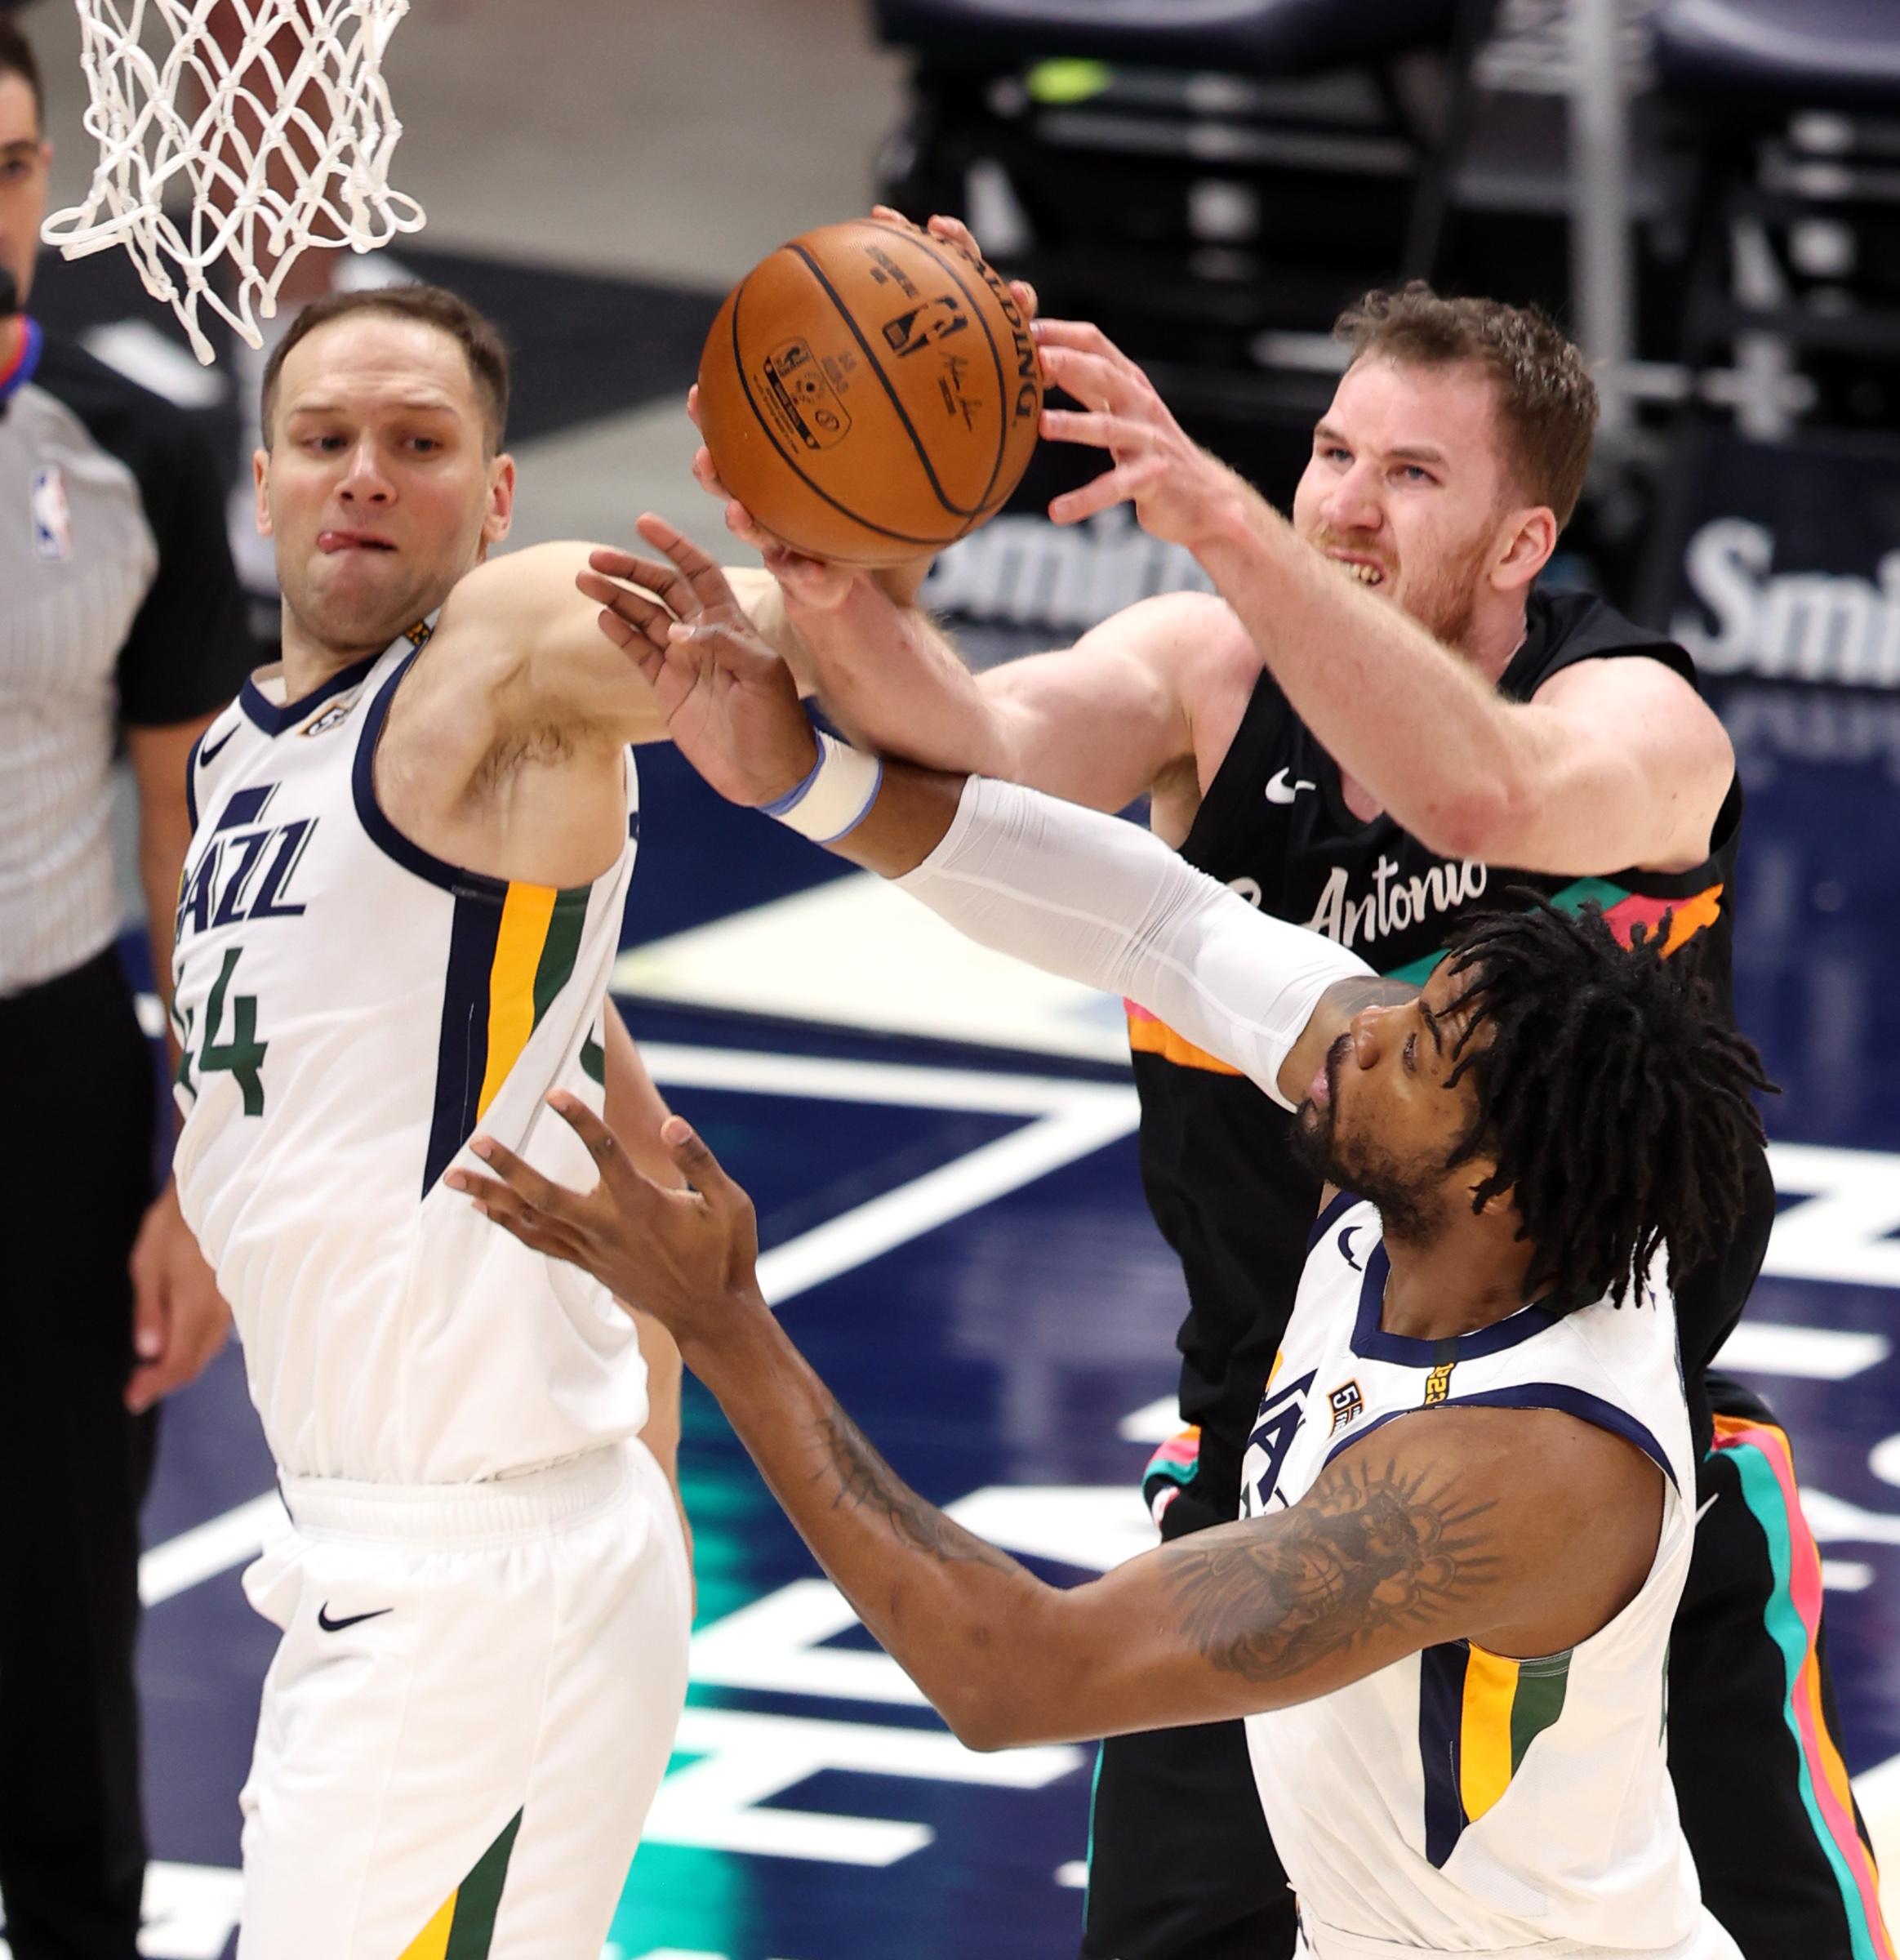 Utah Jazz forward Bojan Bogdanovic (44) and Utah Jazz center Derrick Favors (15) battle San Antonio Spurs center Jakob Poeltl (25) for the ball as the Utah Jazz and the San Antonio Spurs play an NBA basketball game at Vivint Arena in Salt Lake City on Wednesday, May 5, 2021.